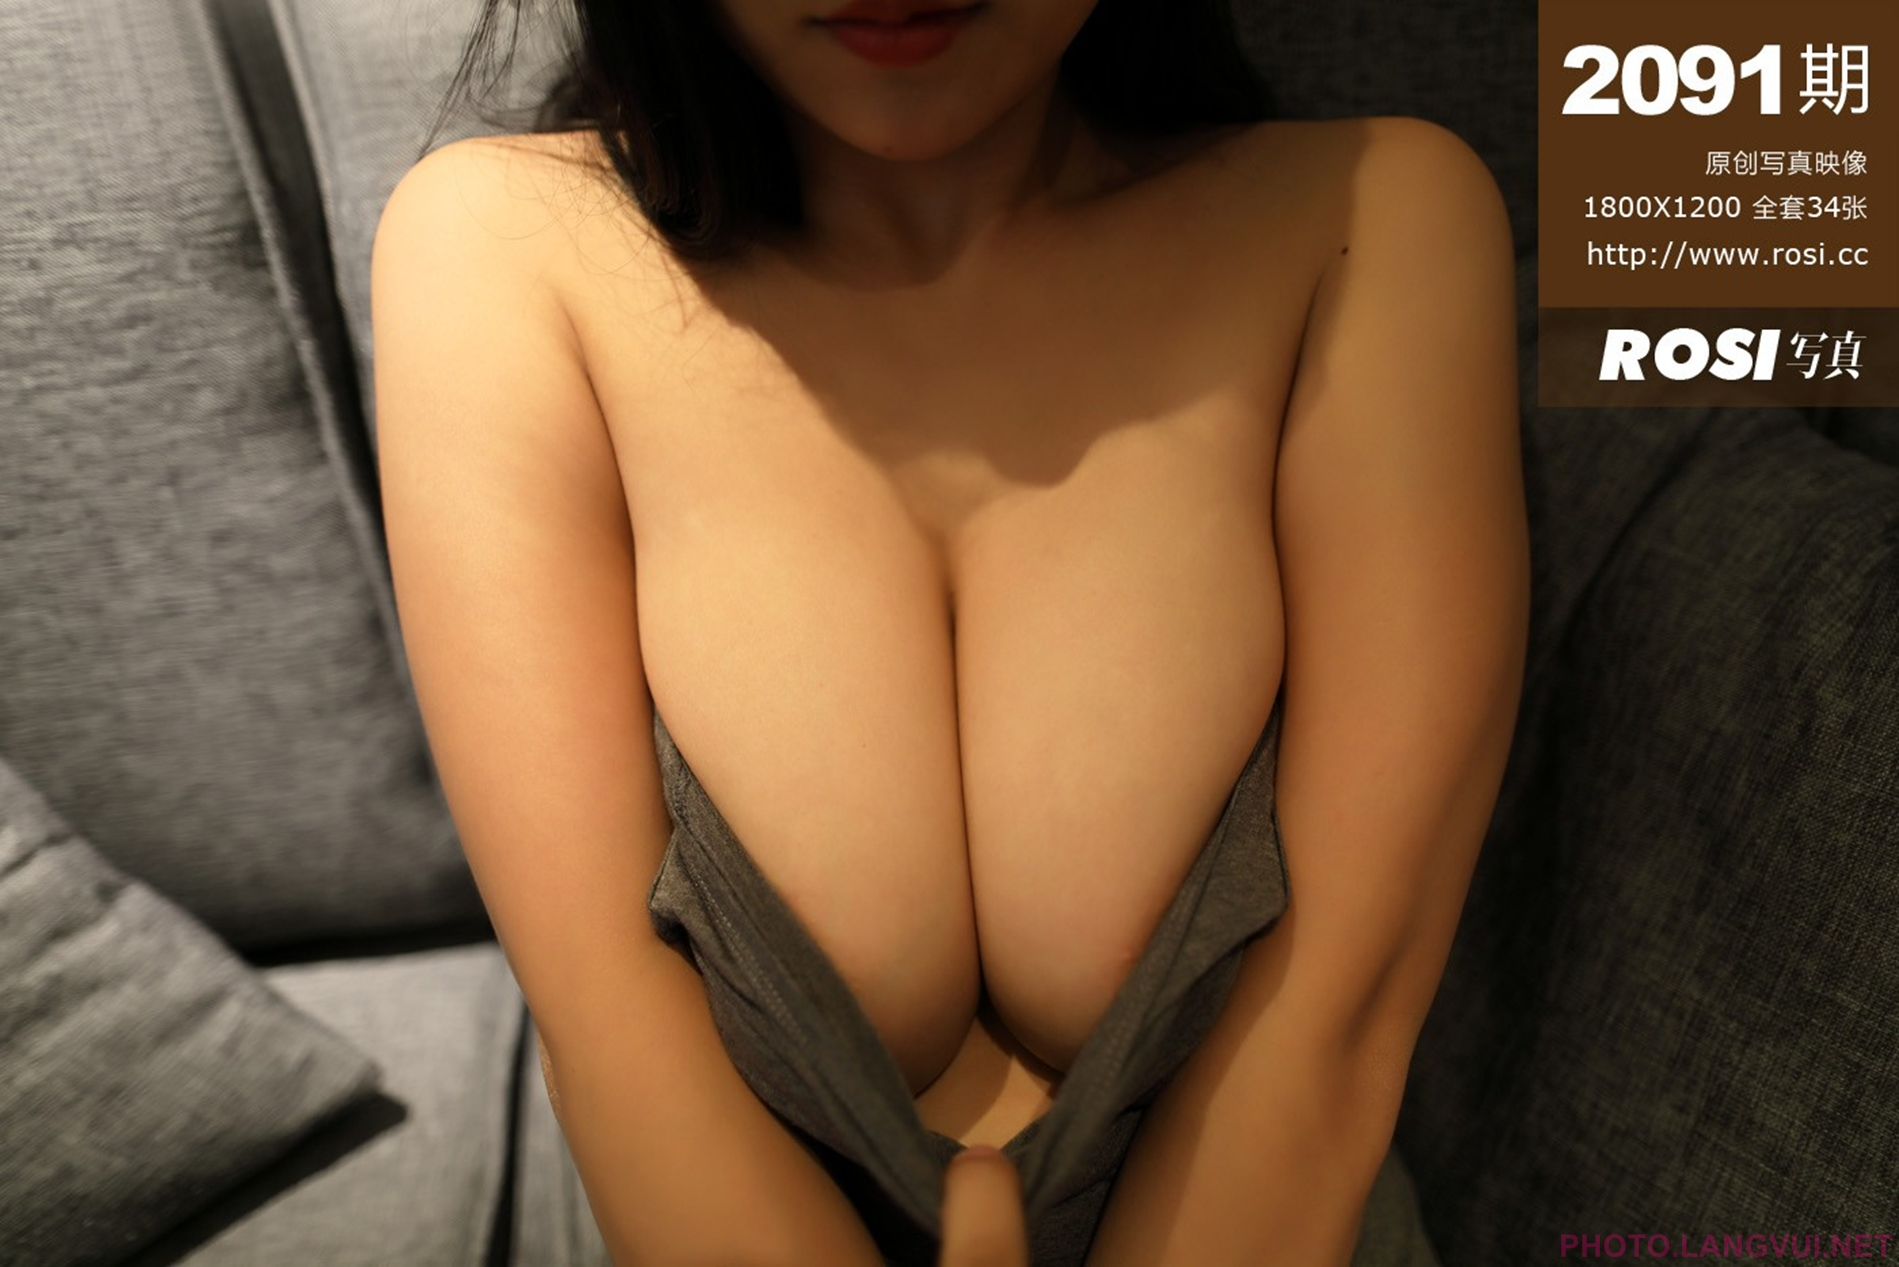 ROSI No 2091